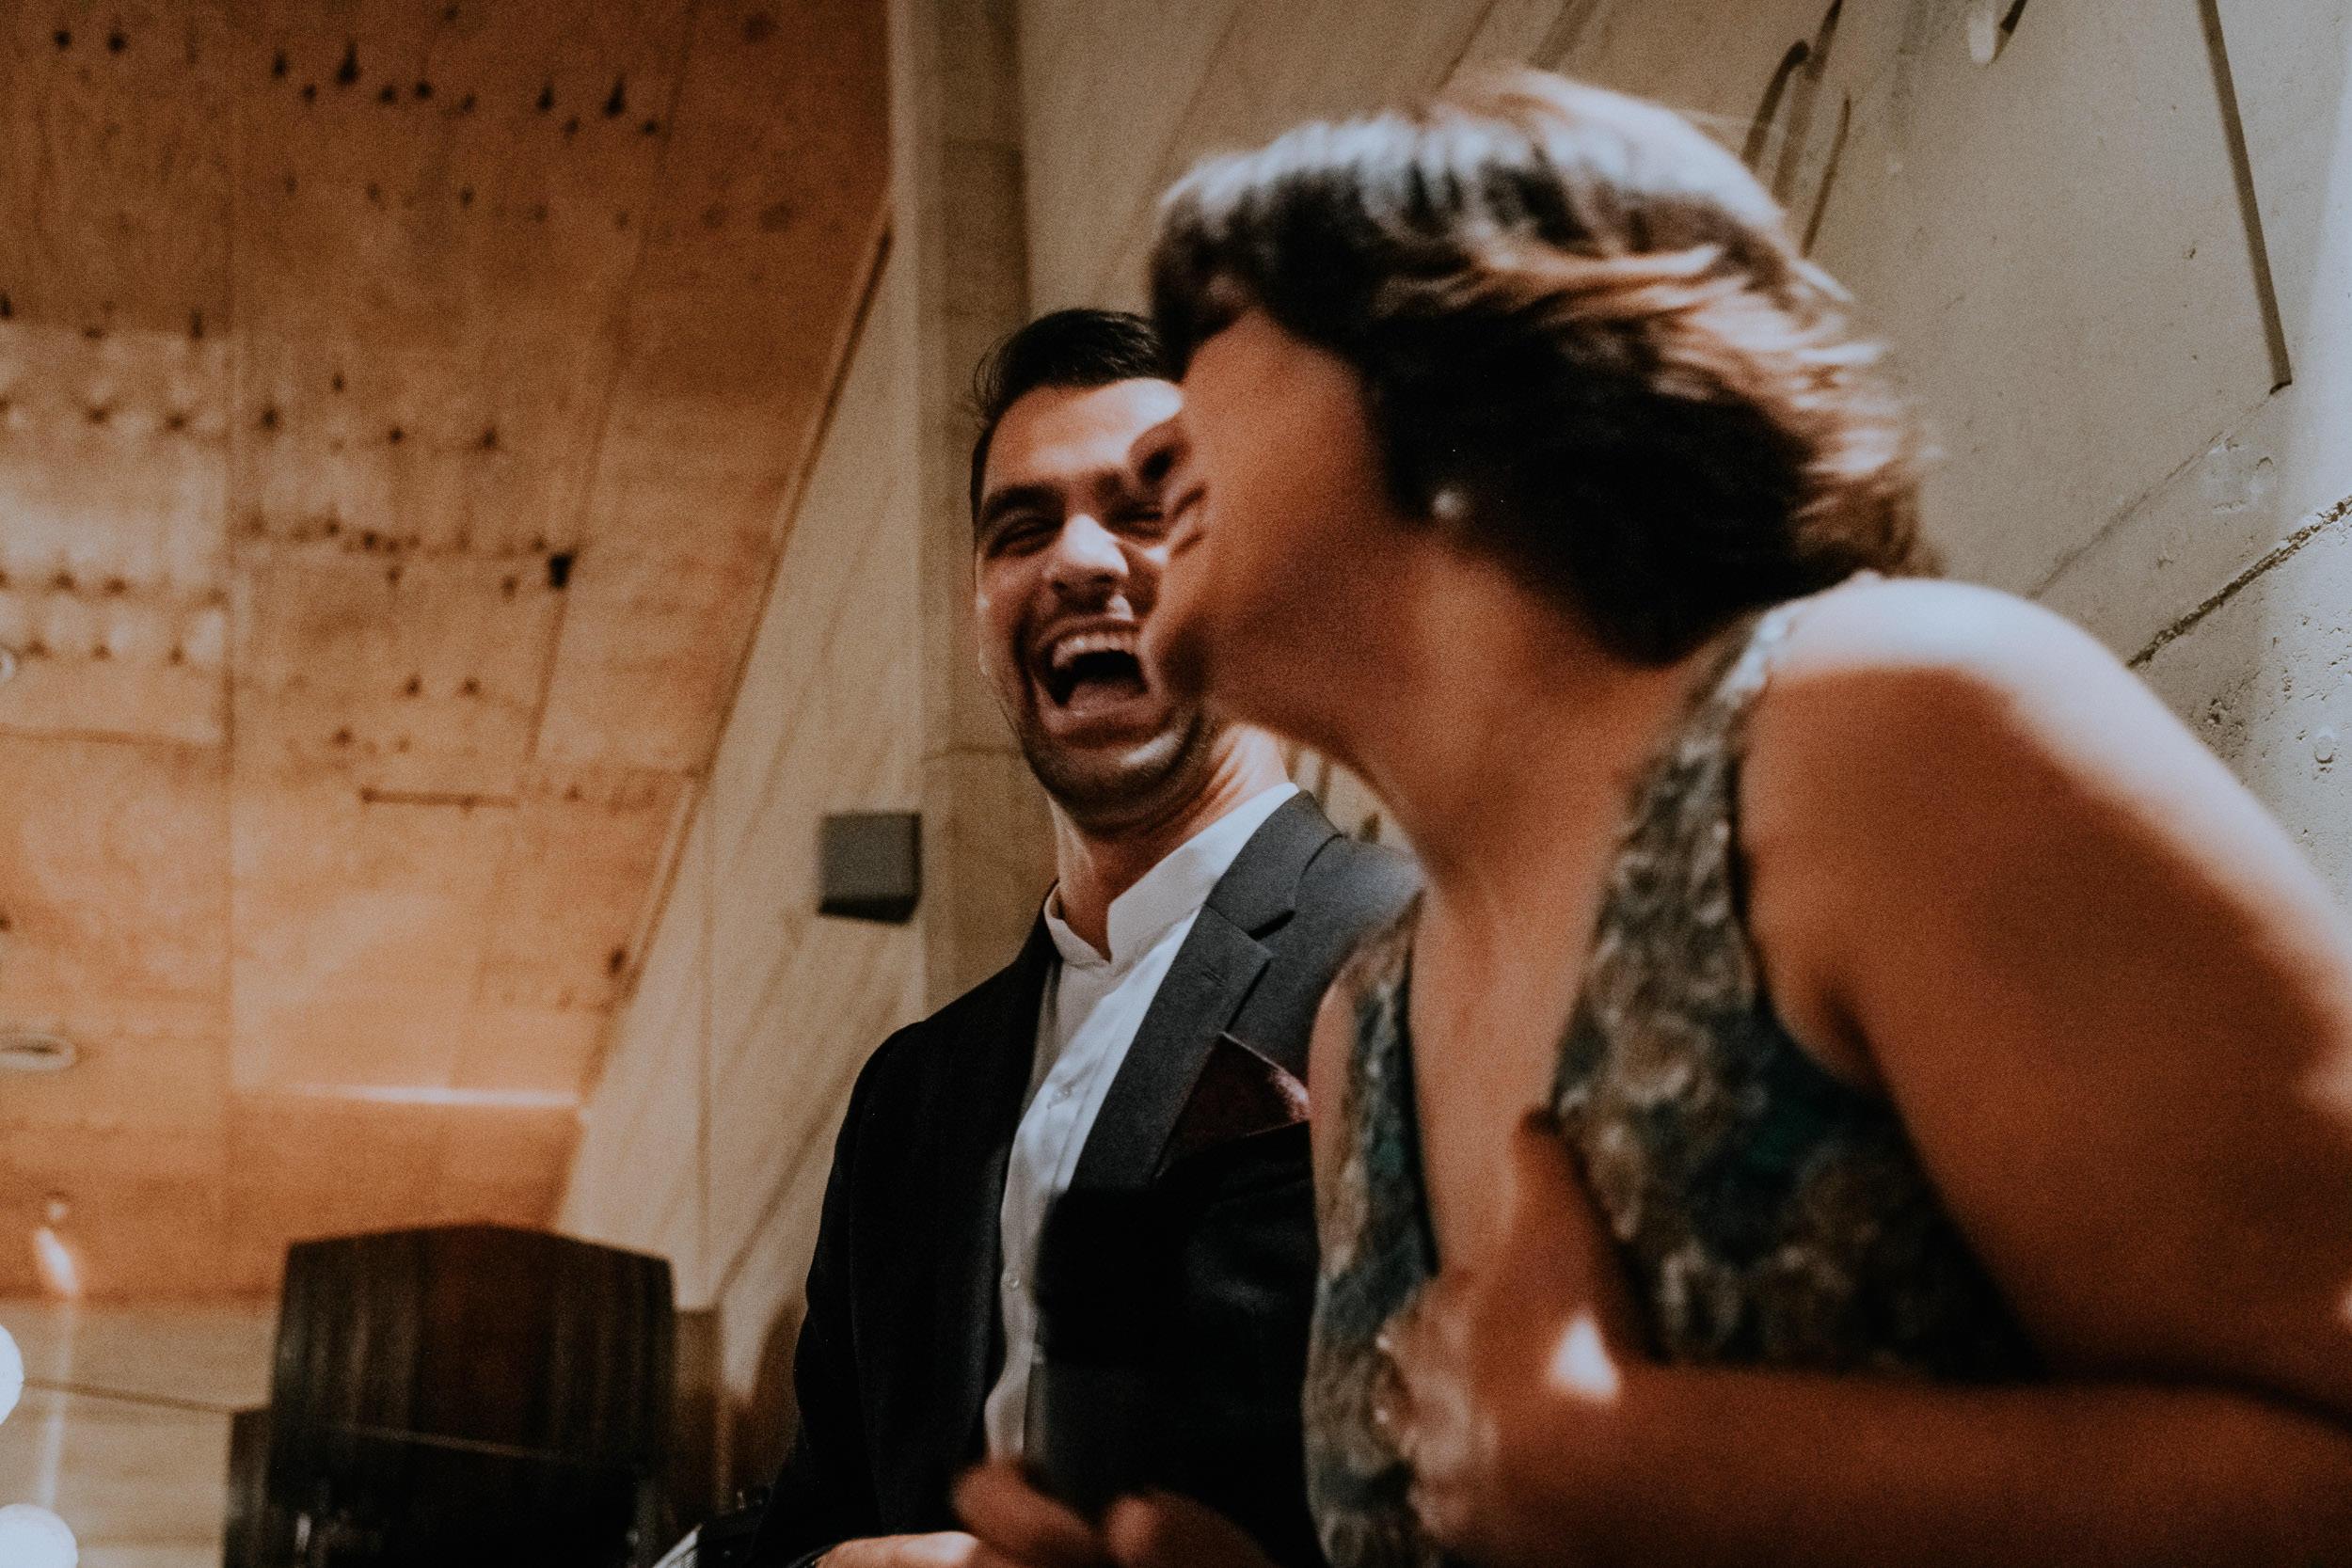 s+j_top_elopement wedding photography_kings & thieves_blog - 525.jpg